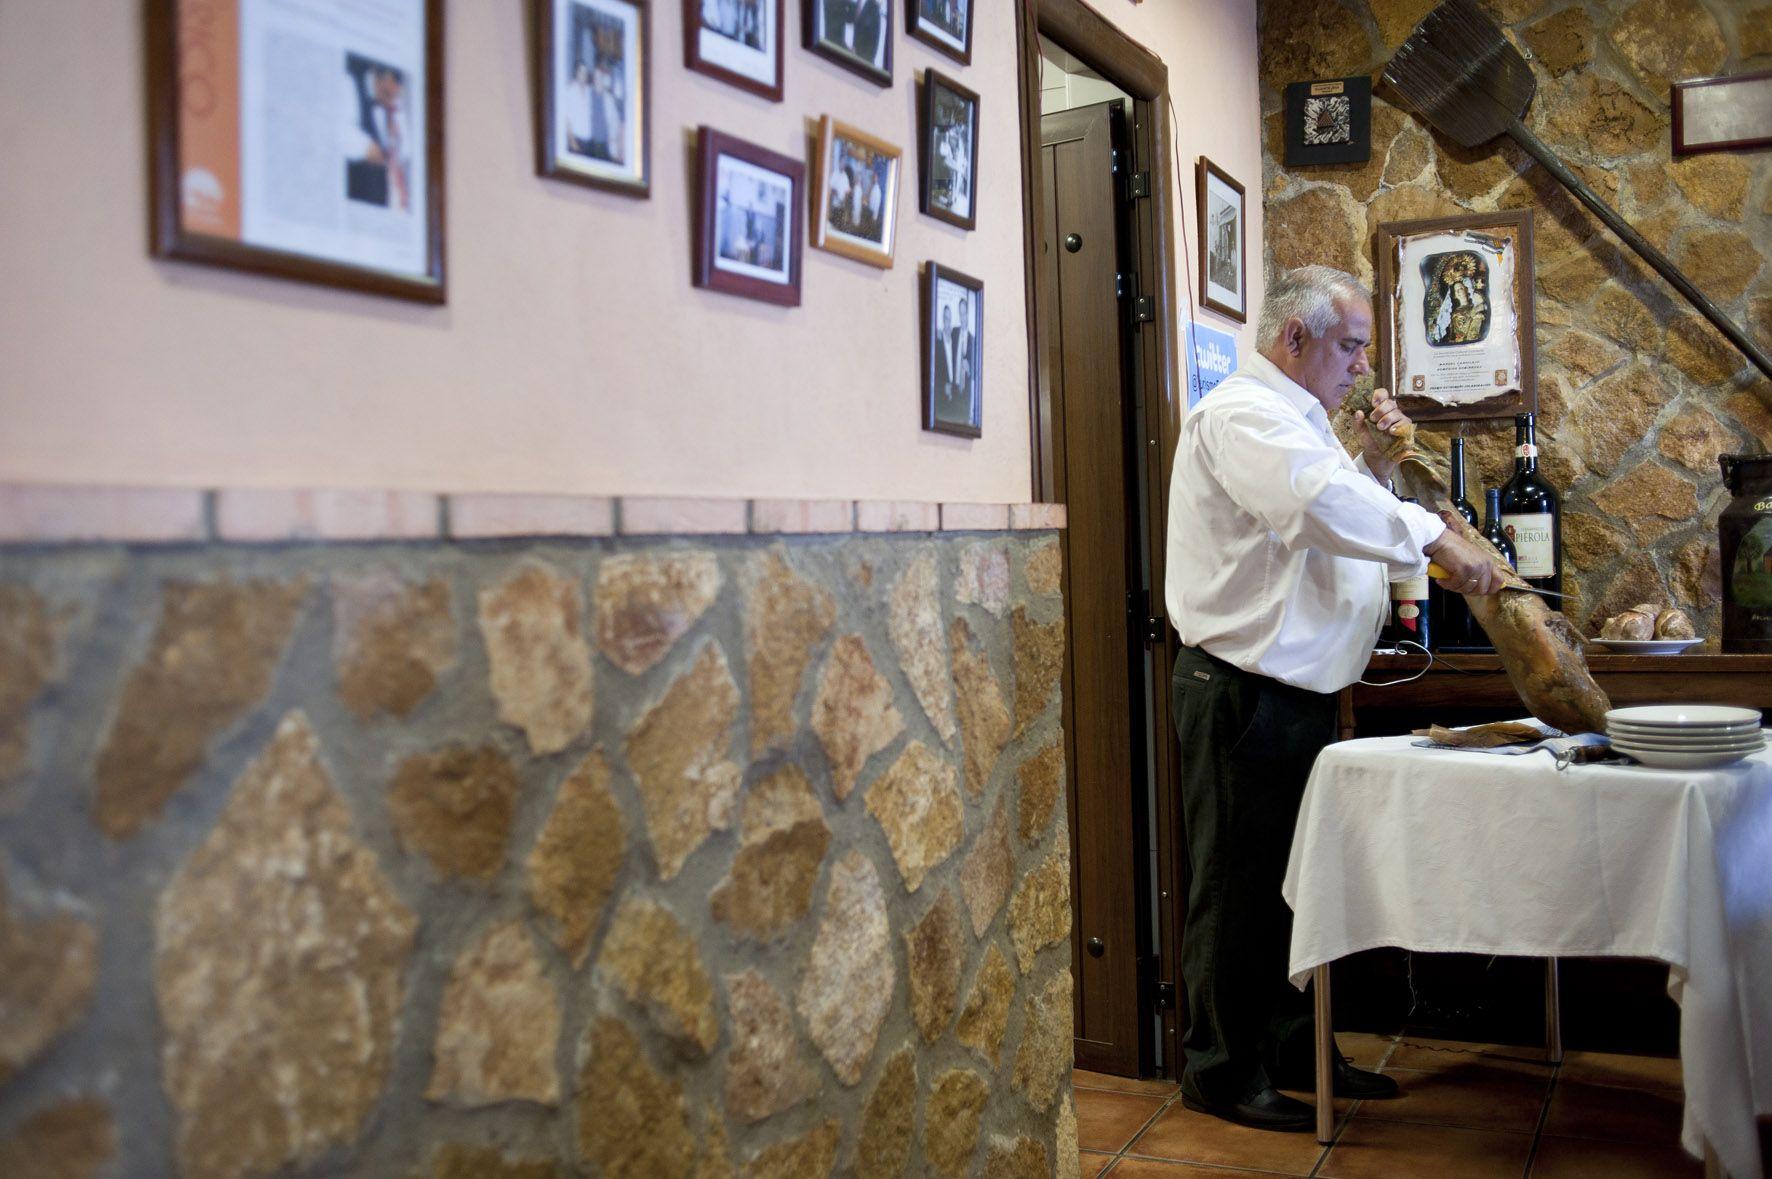 Nito, cortando jamón sin jamonero, Casa Nito, Fregenal de la sierra